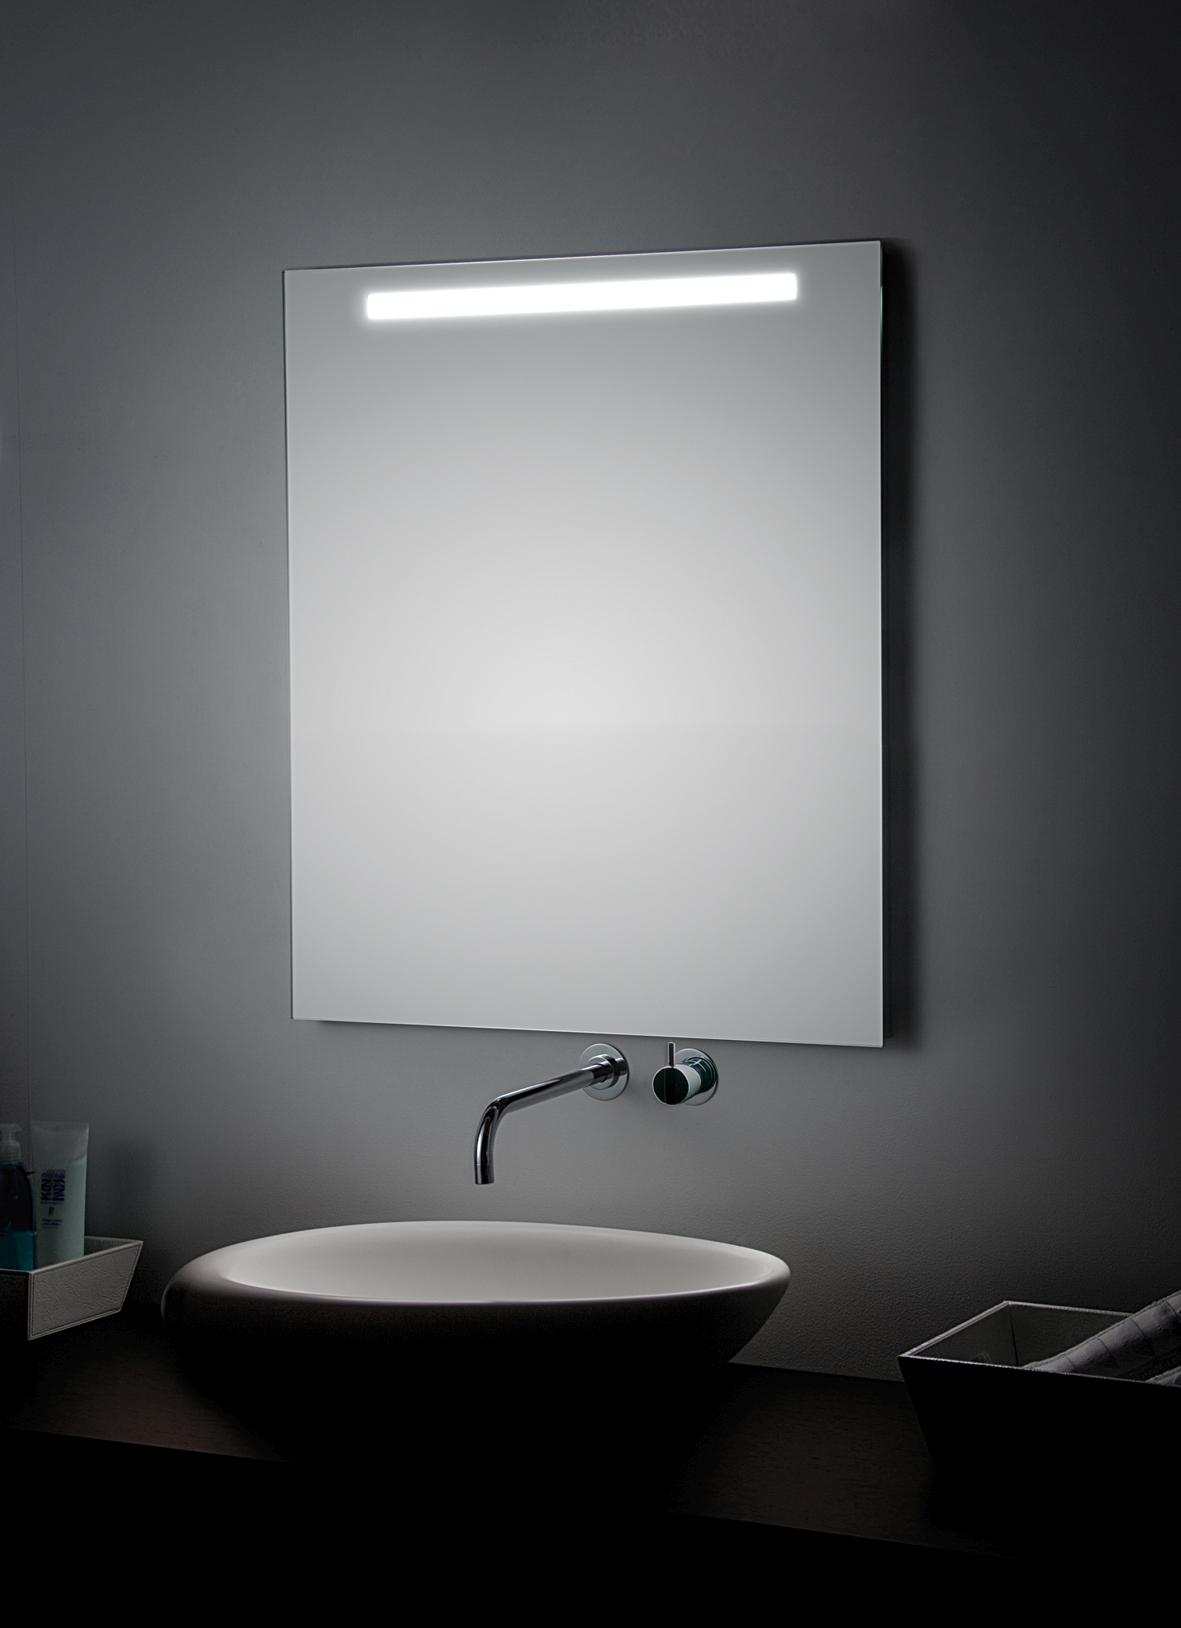 koh i noor illuminazione superiore t5 spiegel mit. Black Bedroom Furniture Sets. Home Design Ideas